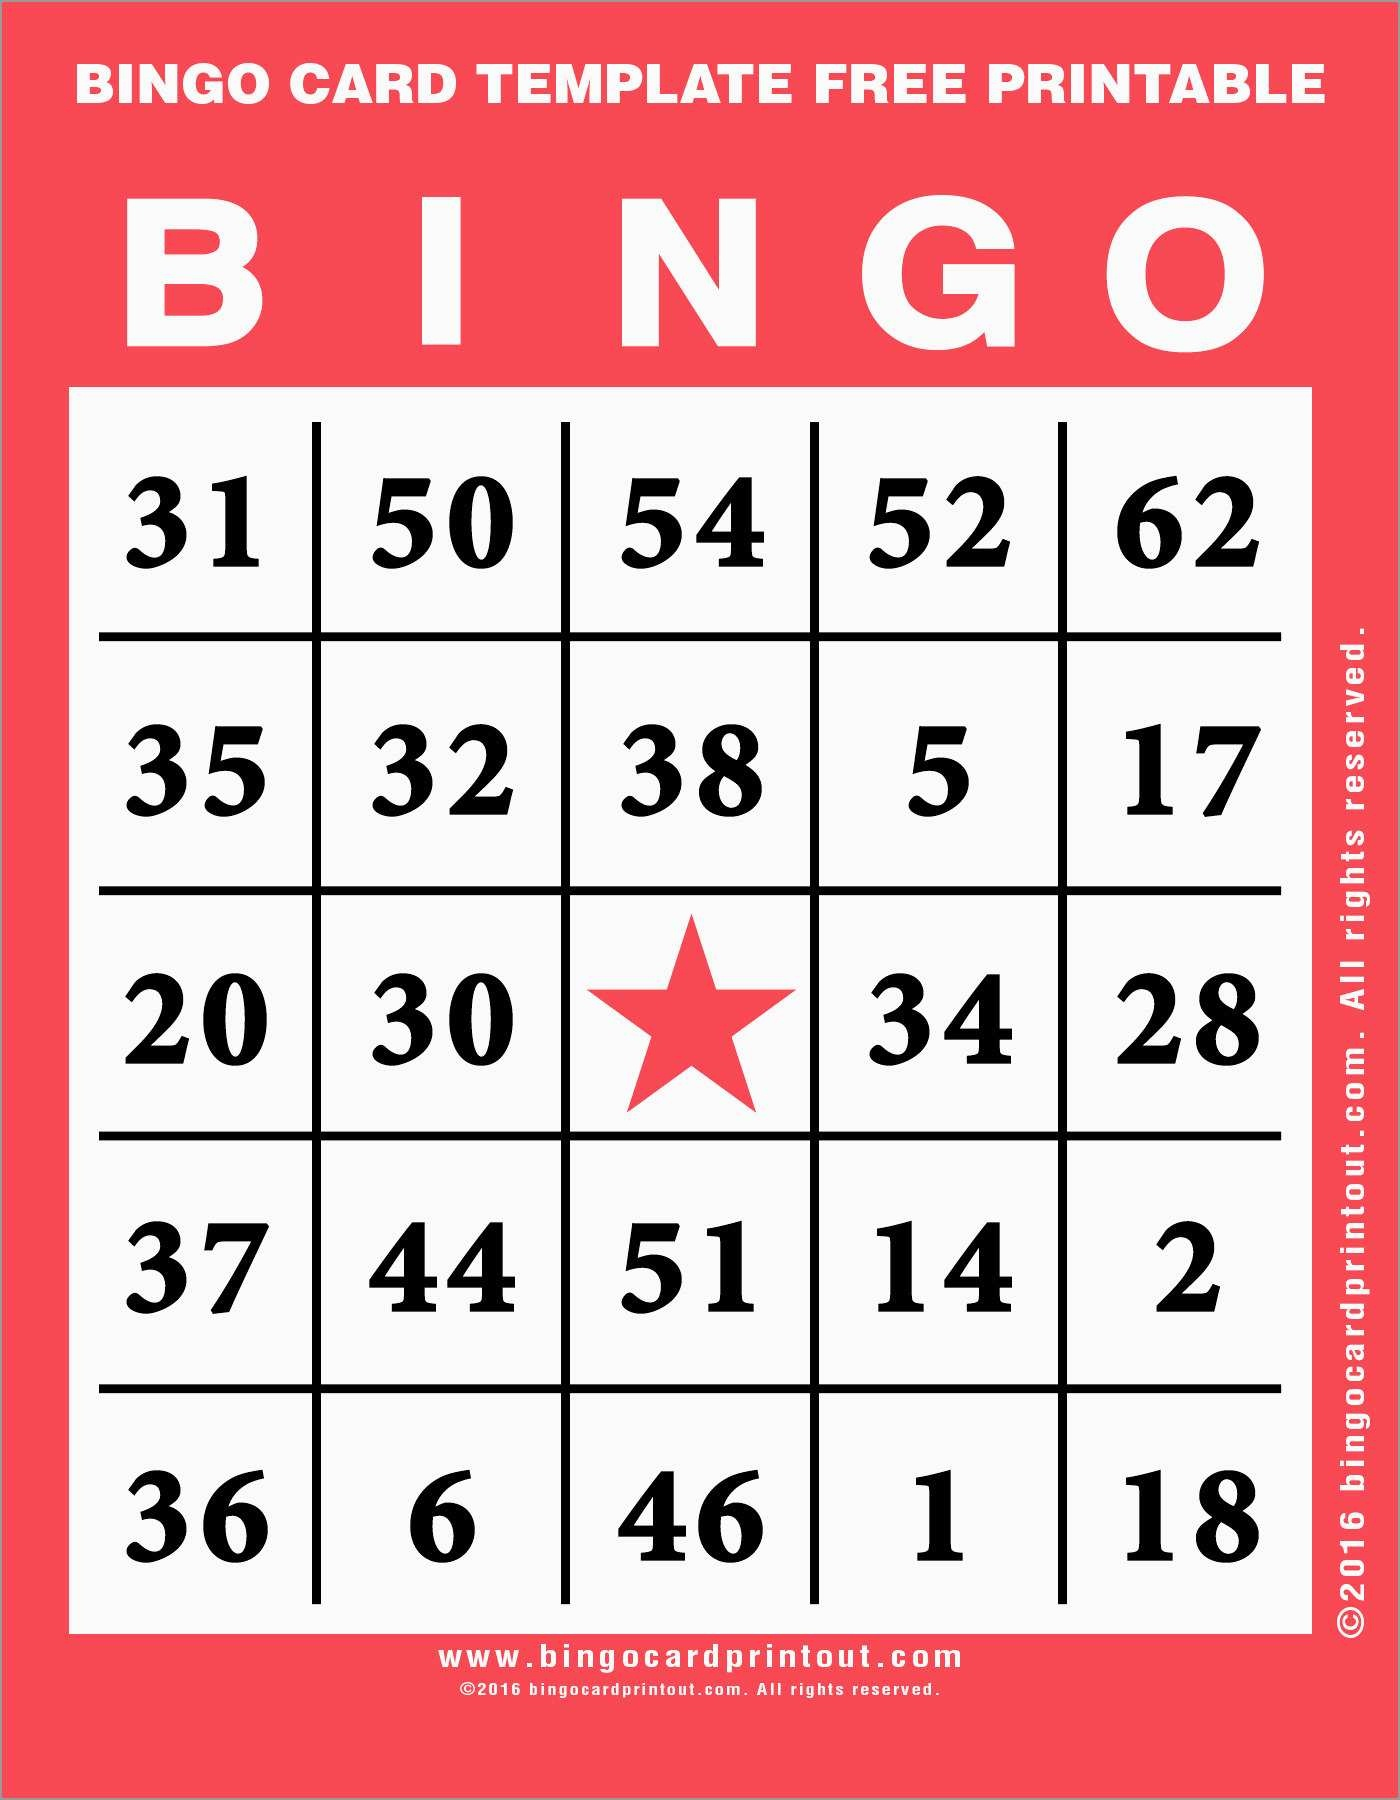 Luxury Bingo Card Template Free | Best Of Template - Free Printable Bingo Cards 1 75